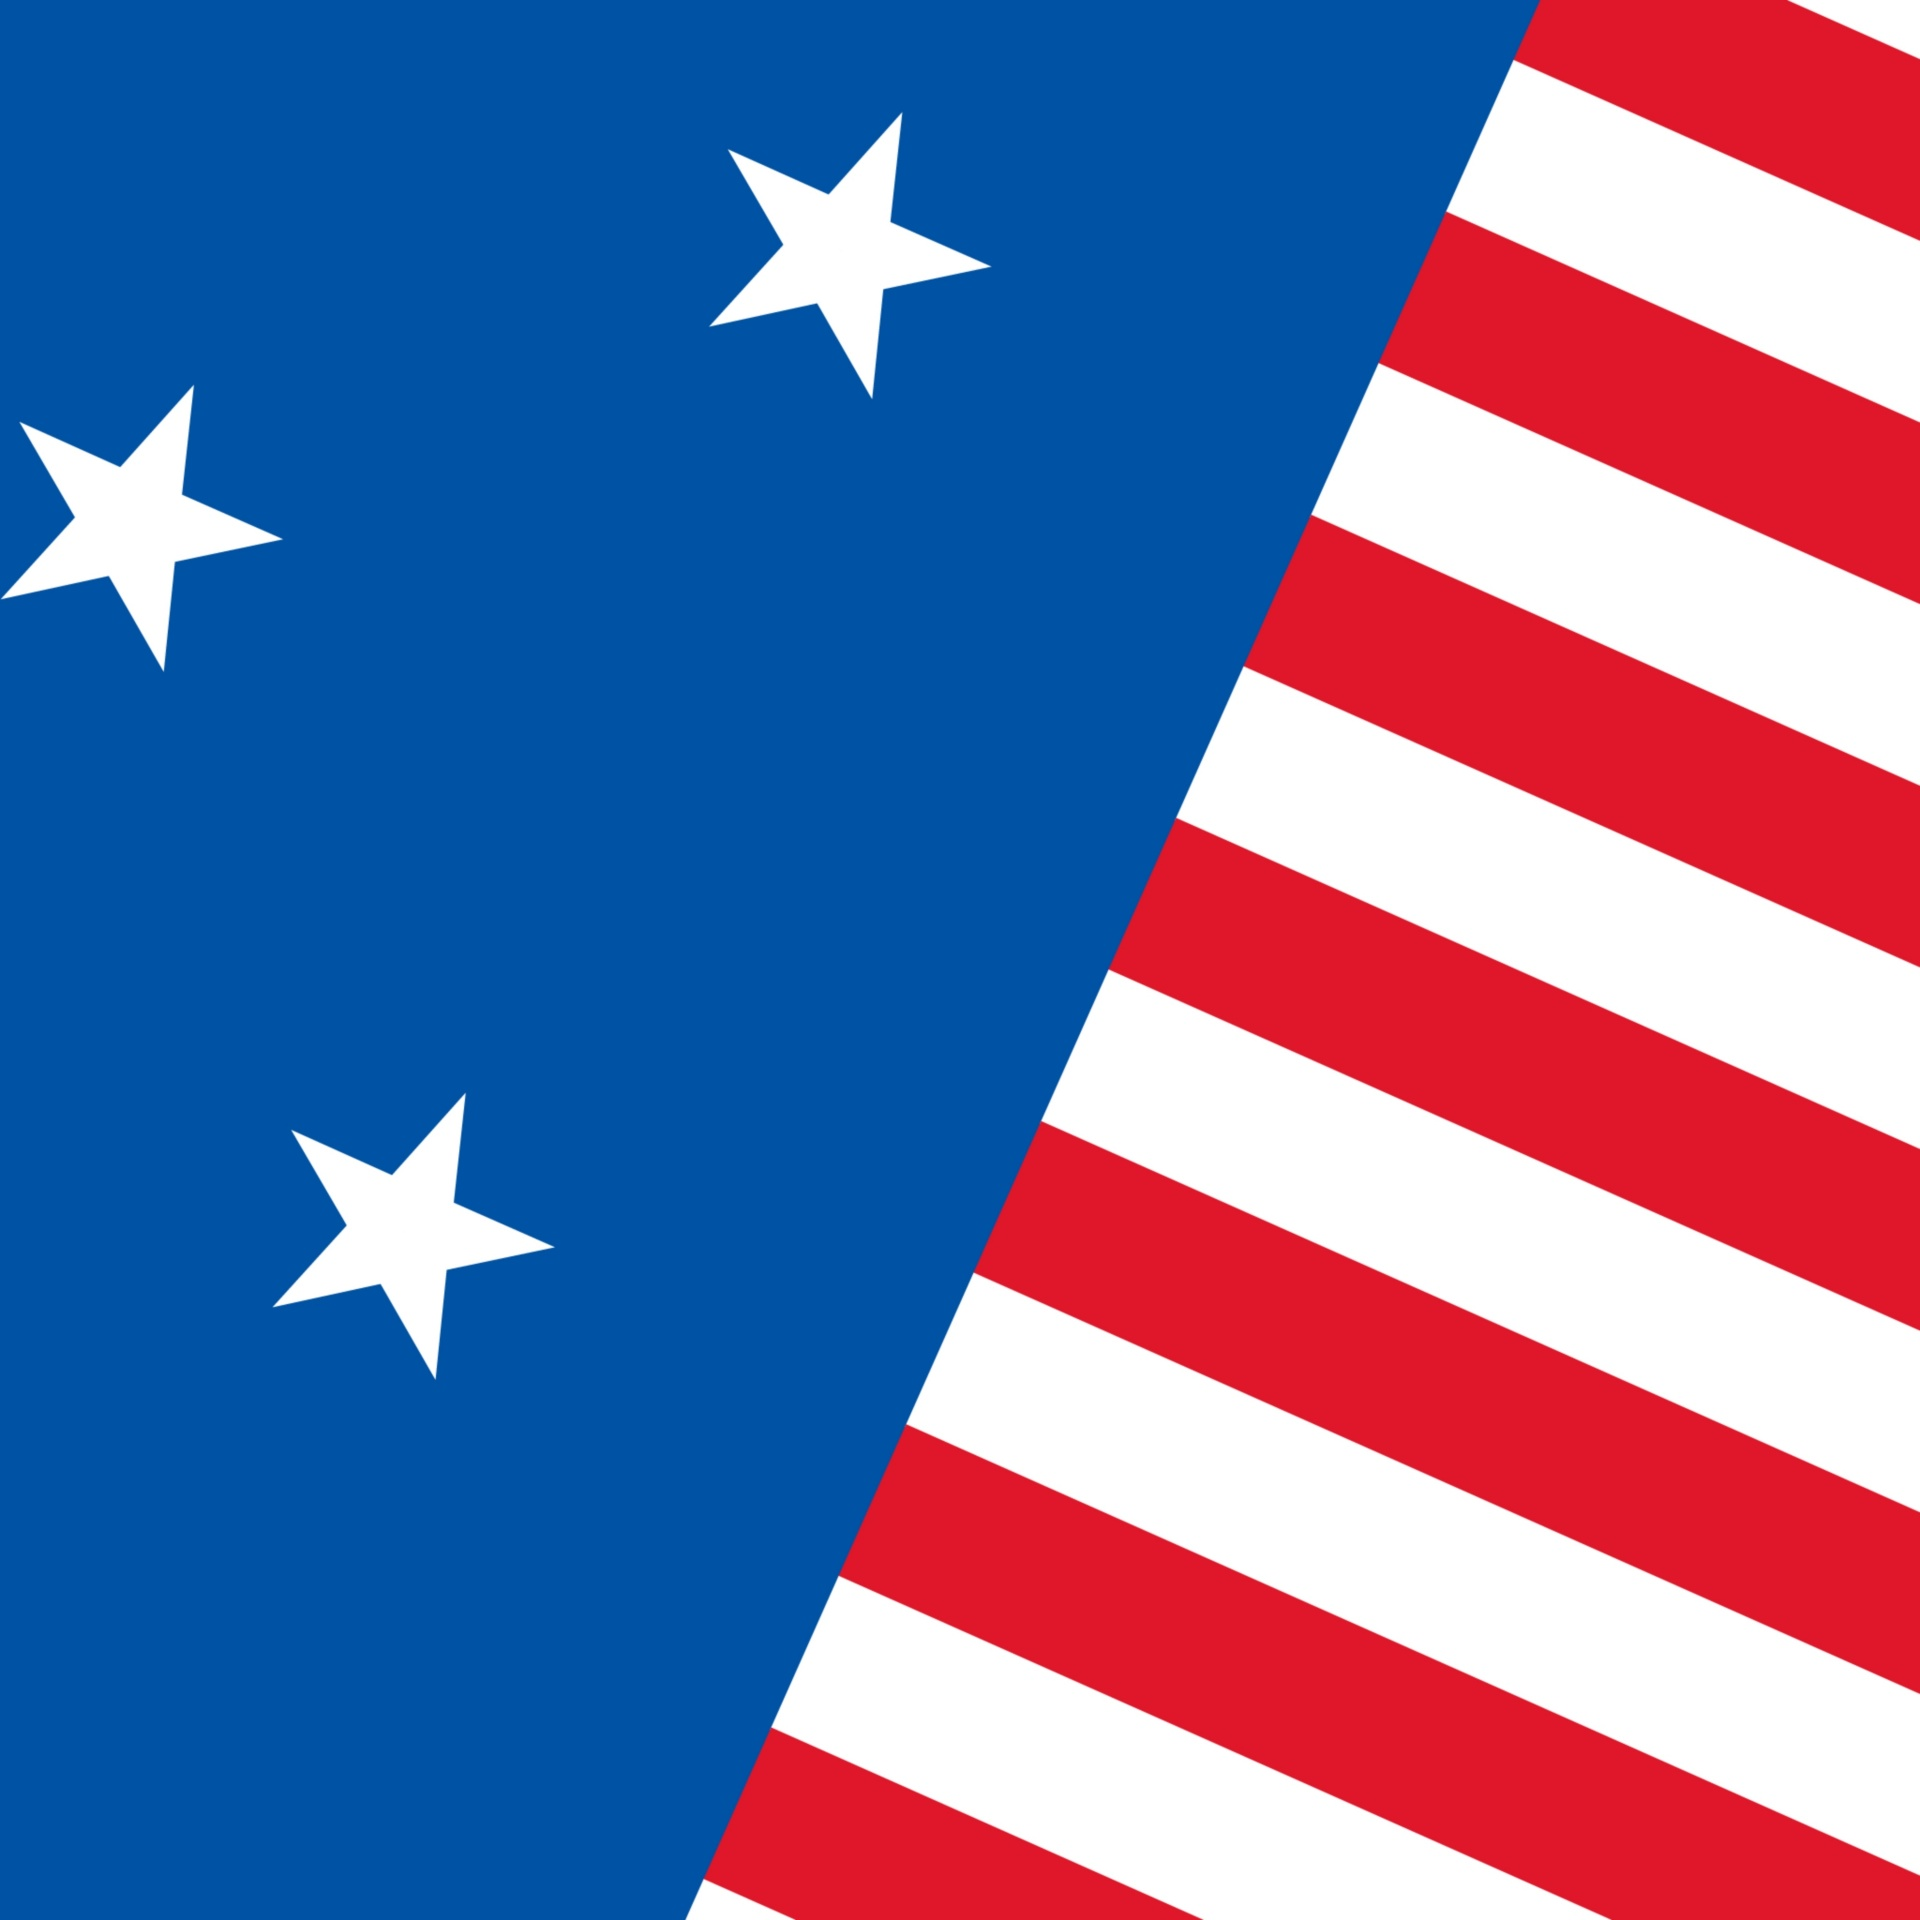 American,flag,square,image,stars.